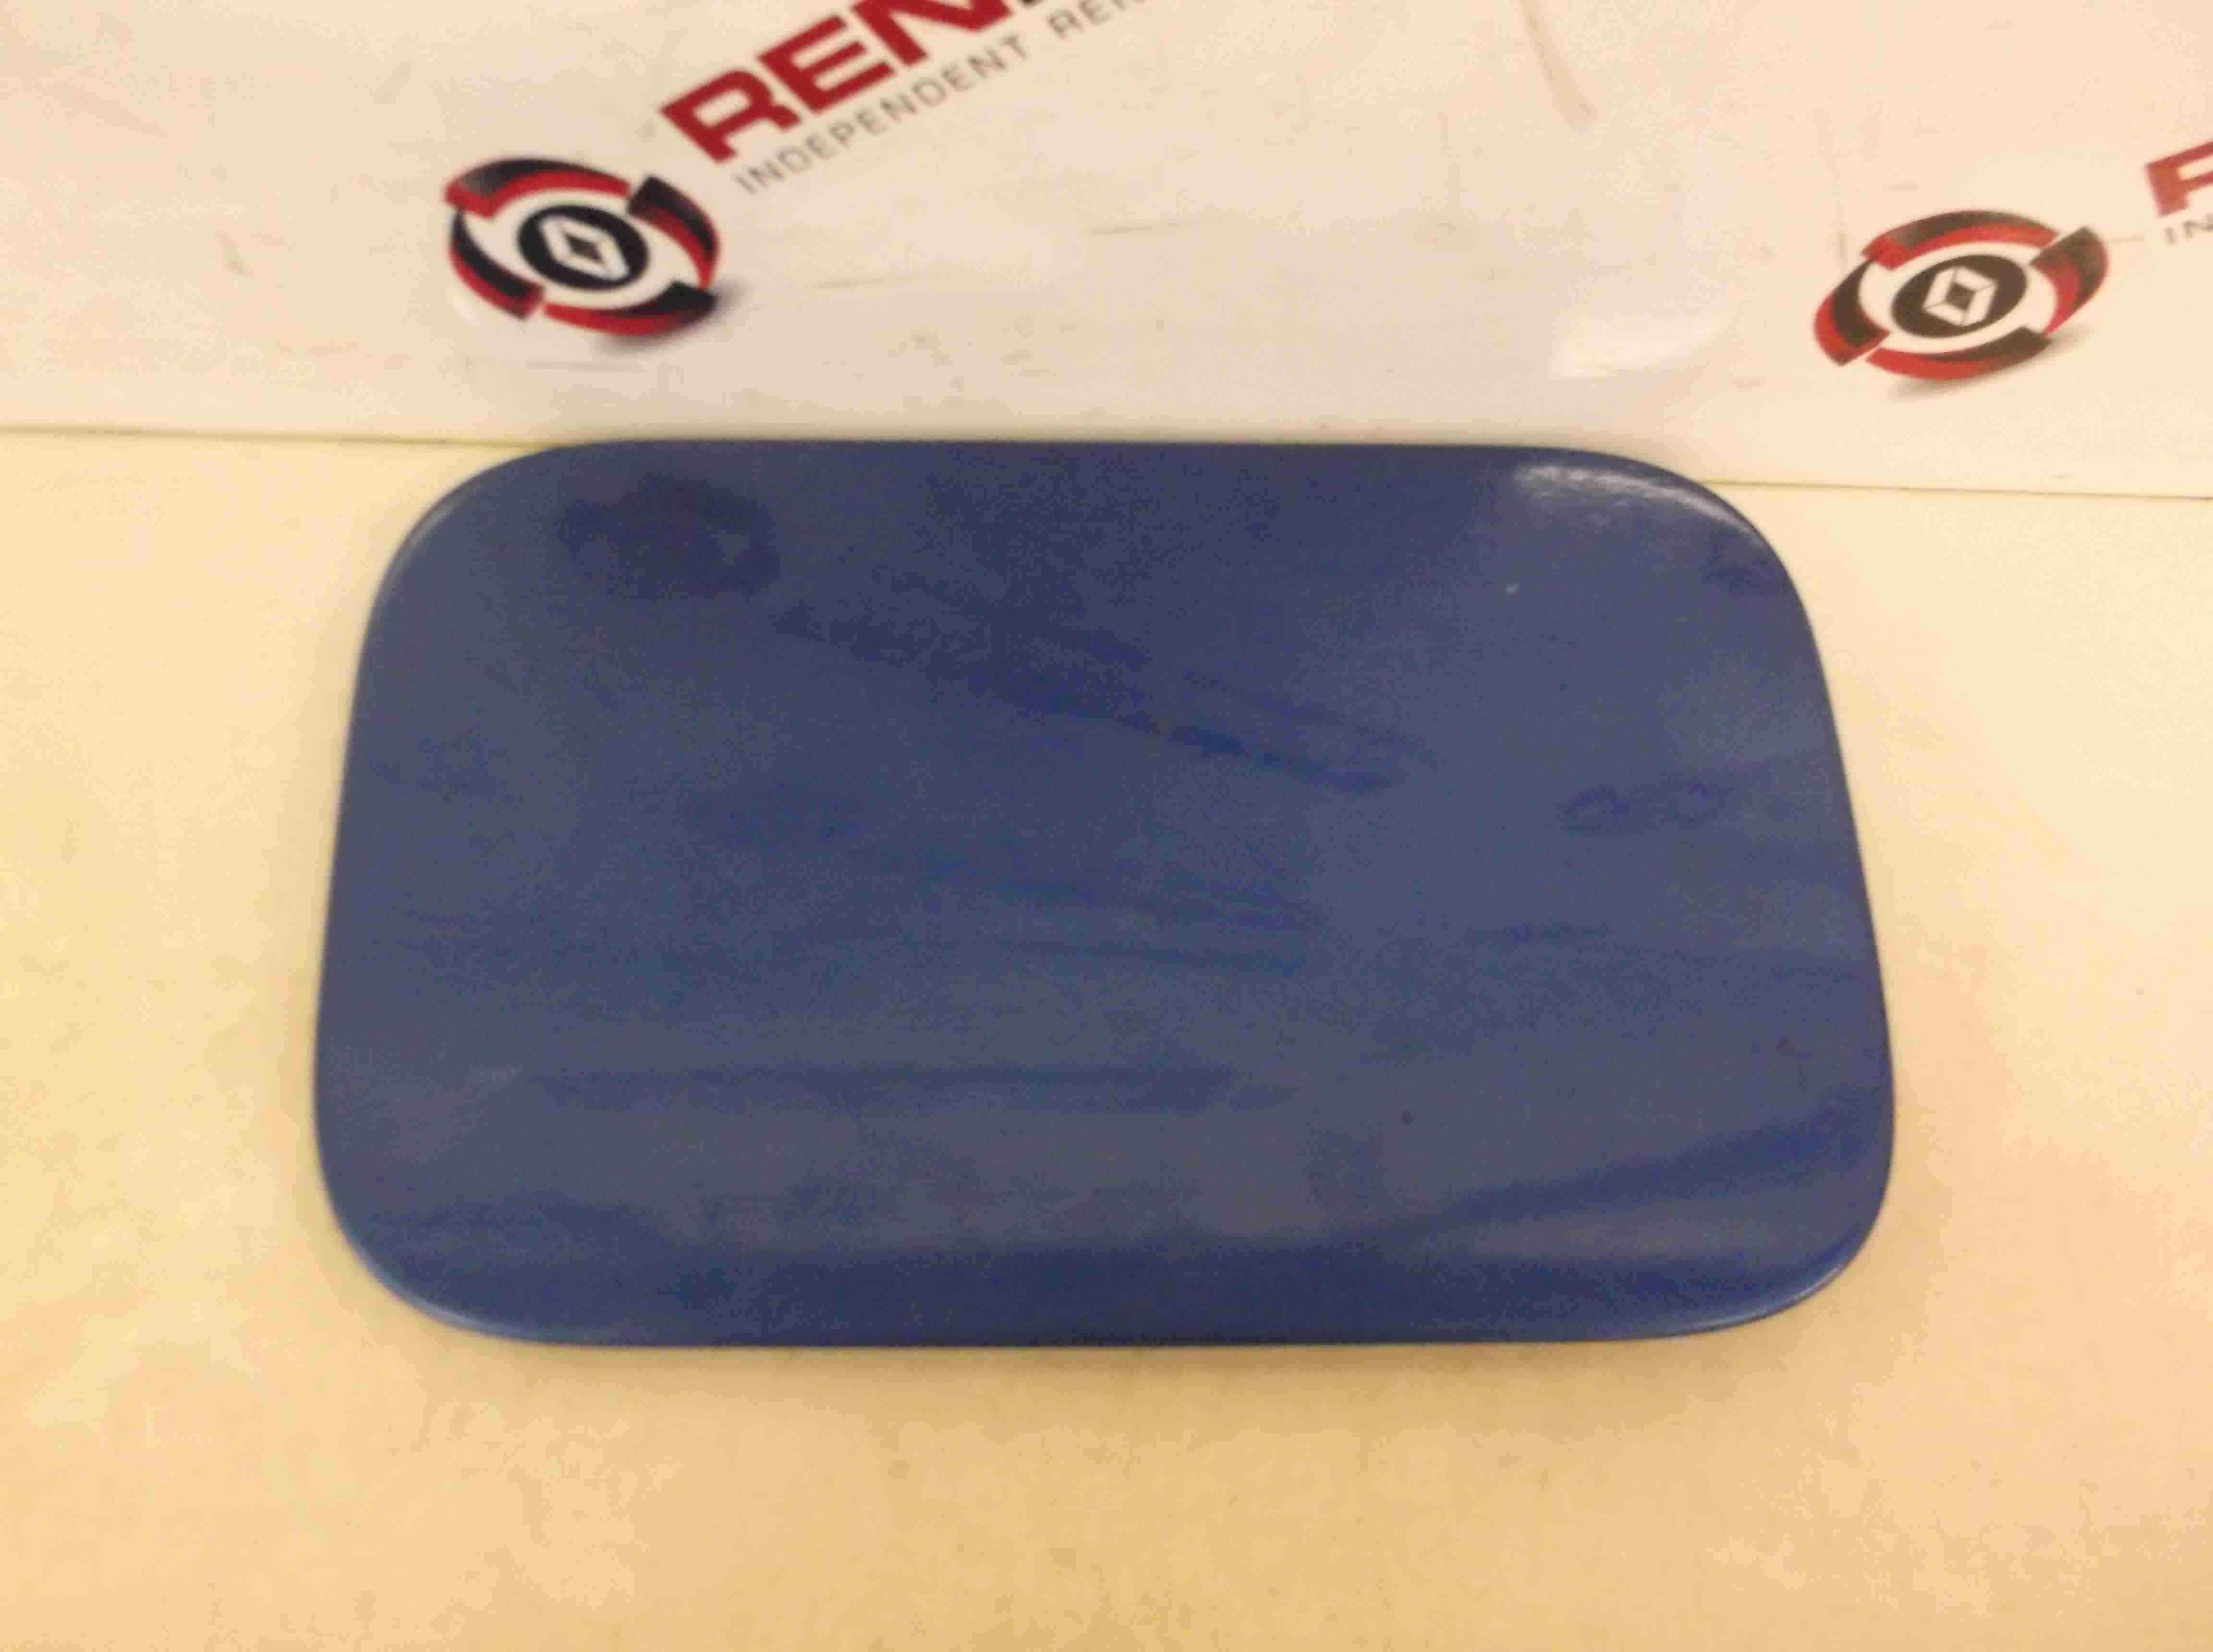 Renault Megane Scenic 2003-2009 Fuel Flap Cover Blue TEI45  8200228509